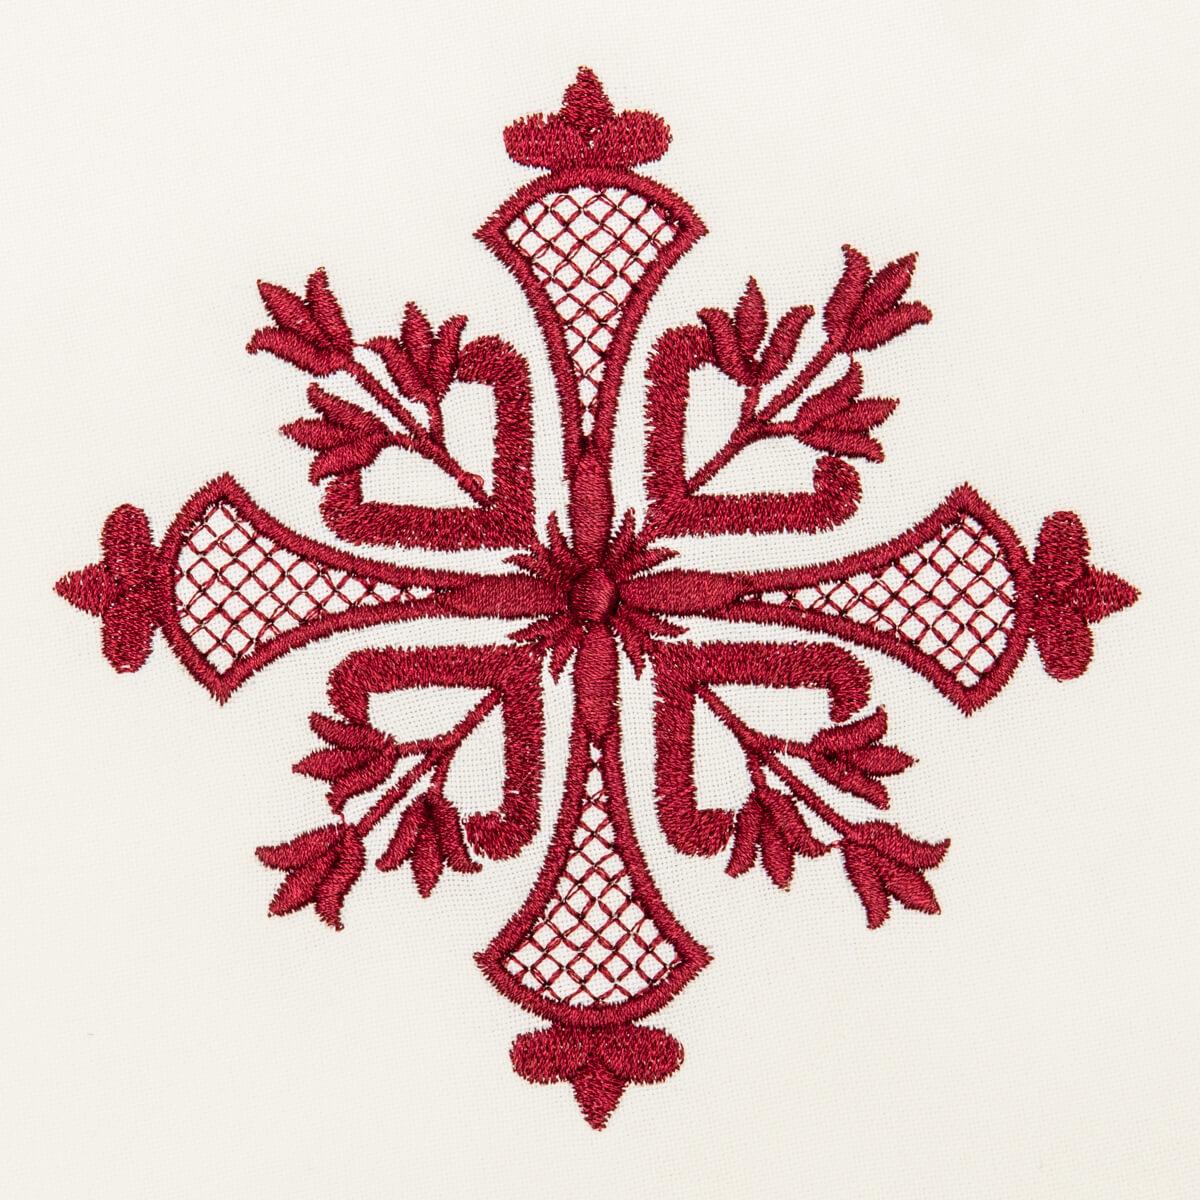 Matriz de bordado Cruz Mistica